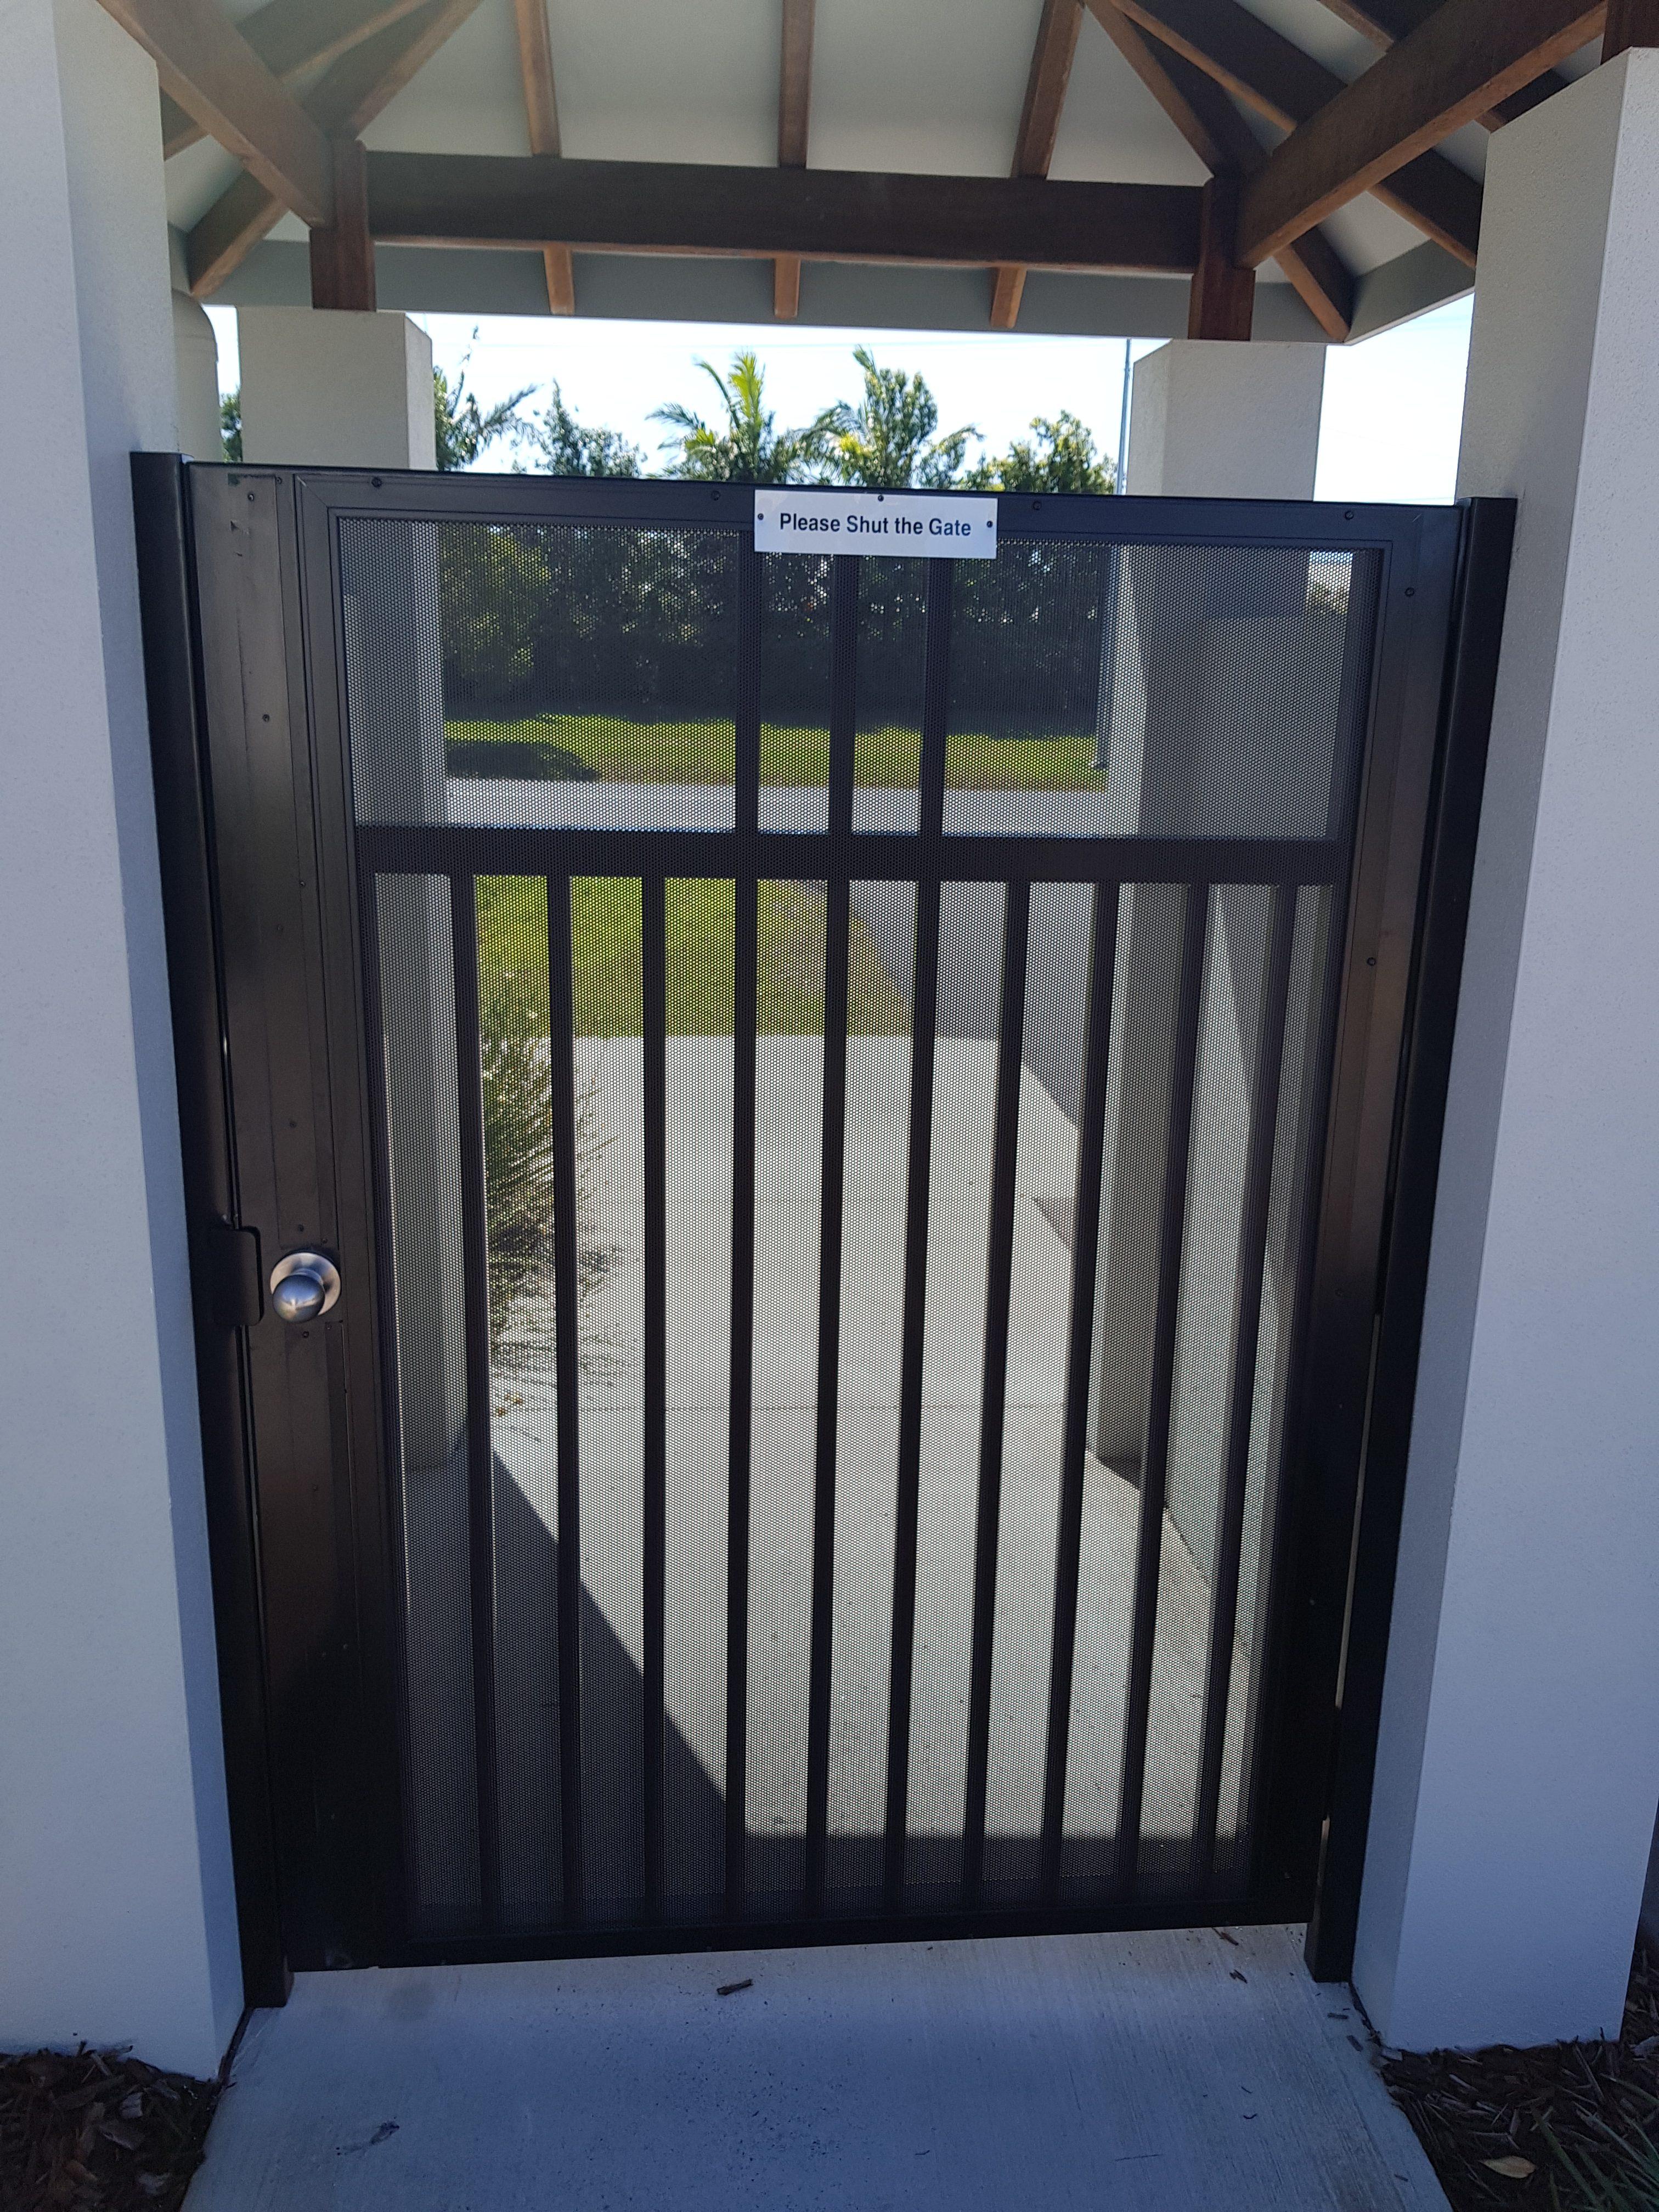 Xceed Perforated Aluminium Screen over Gate